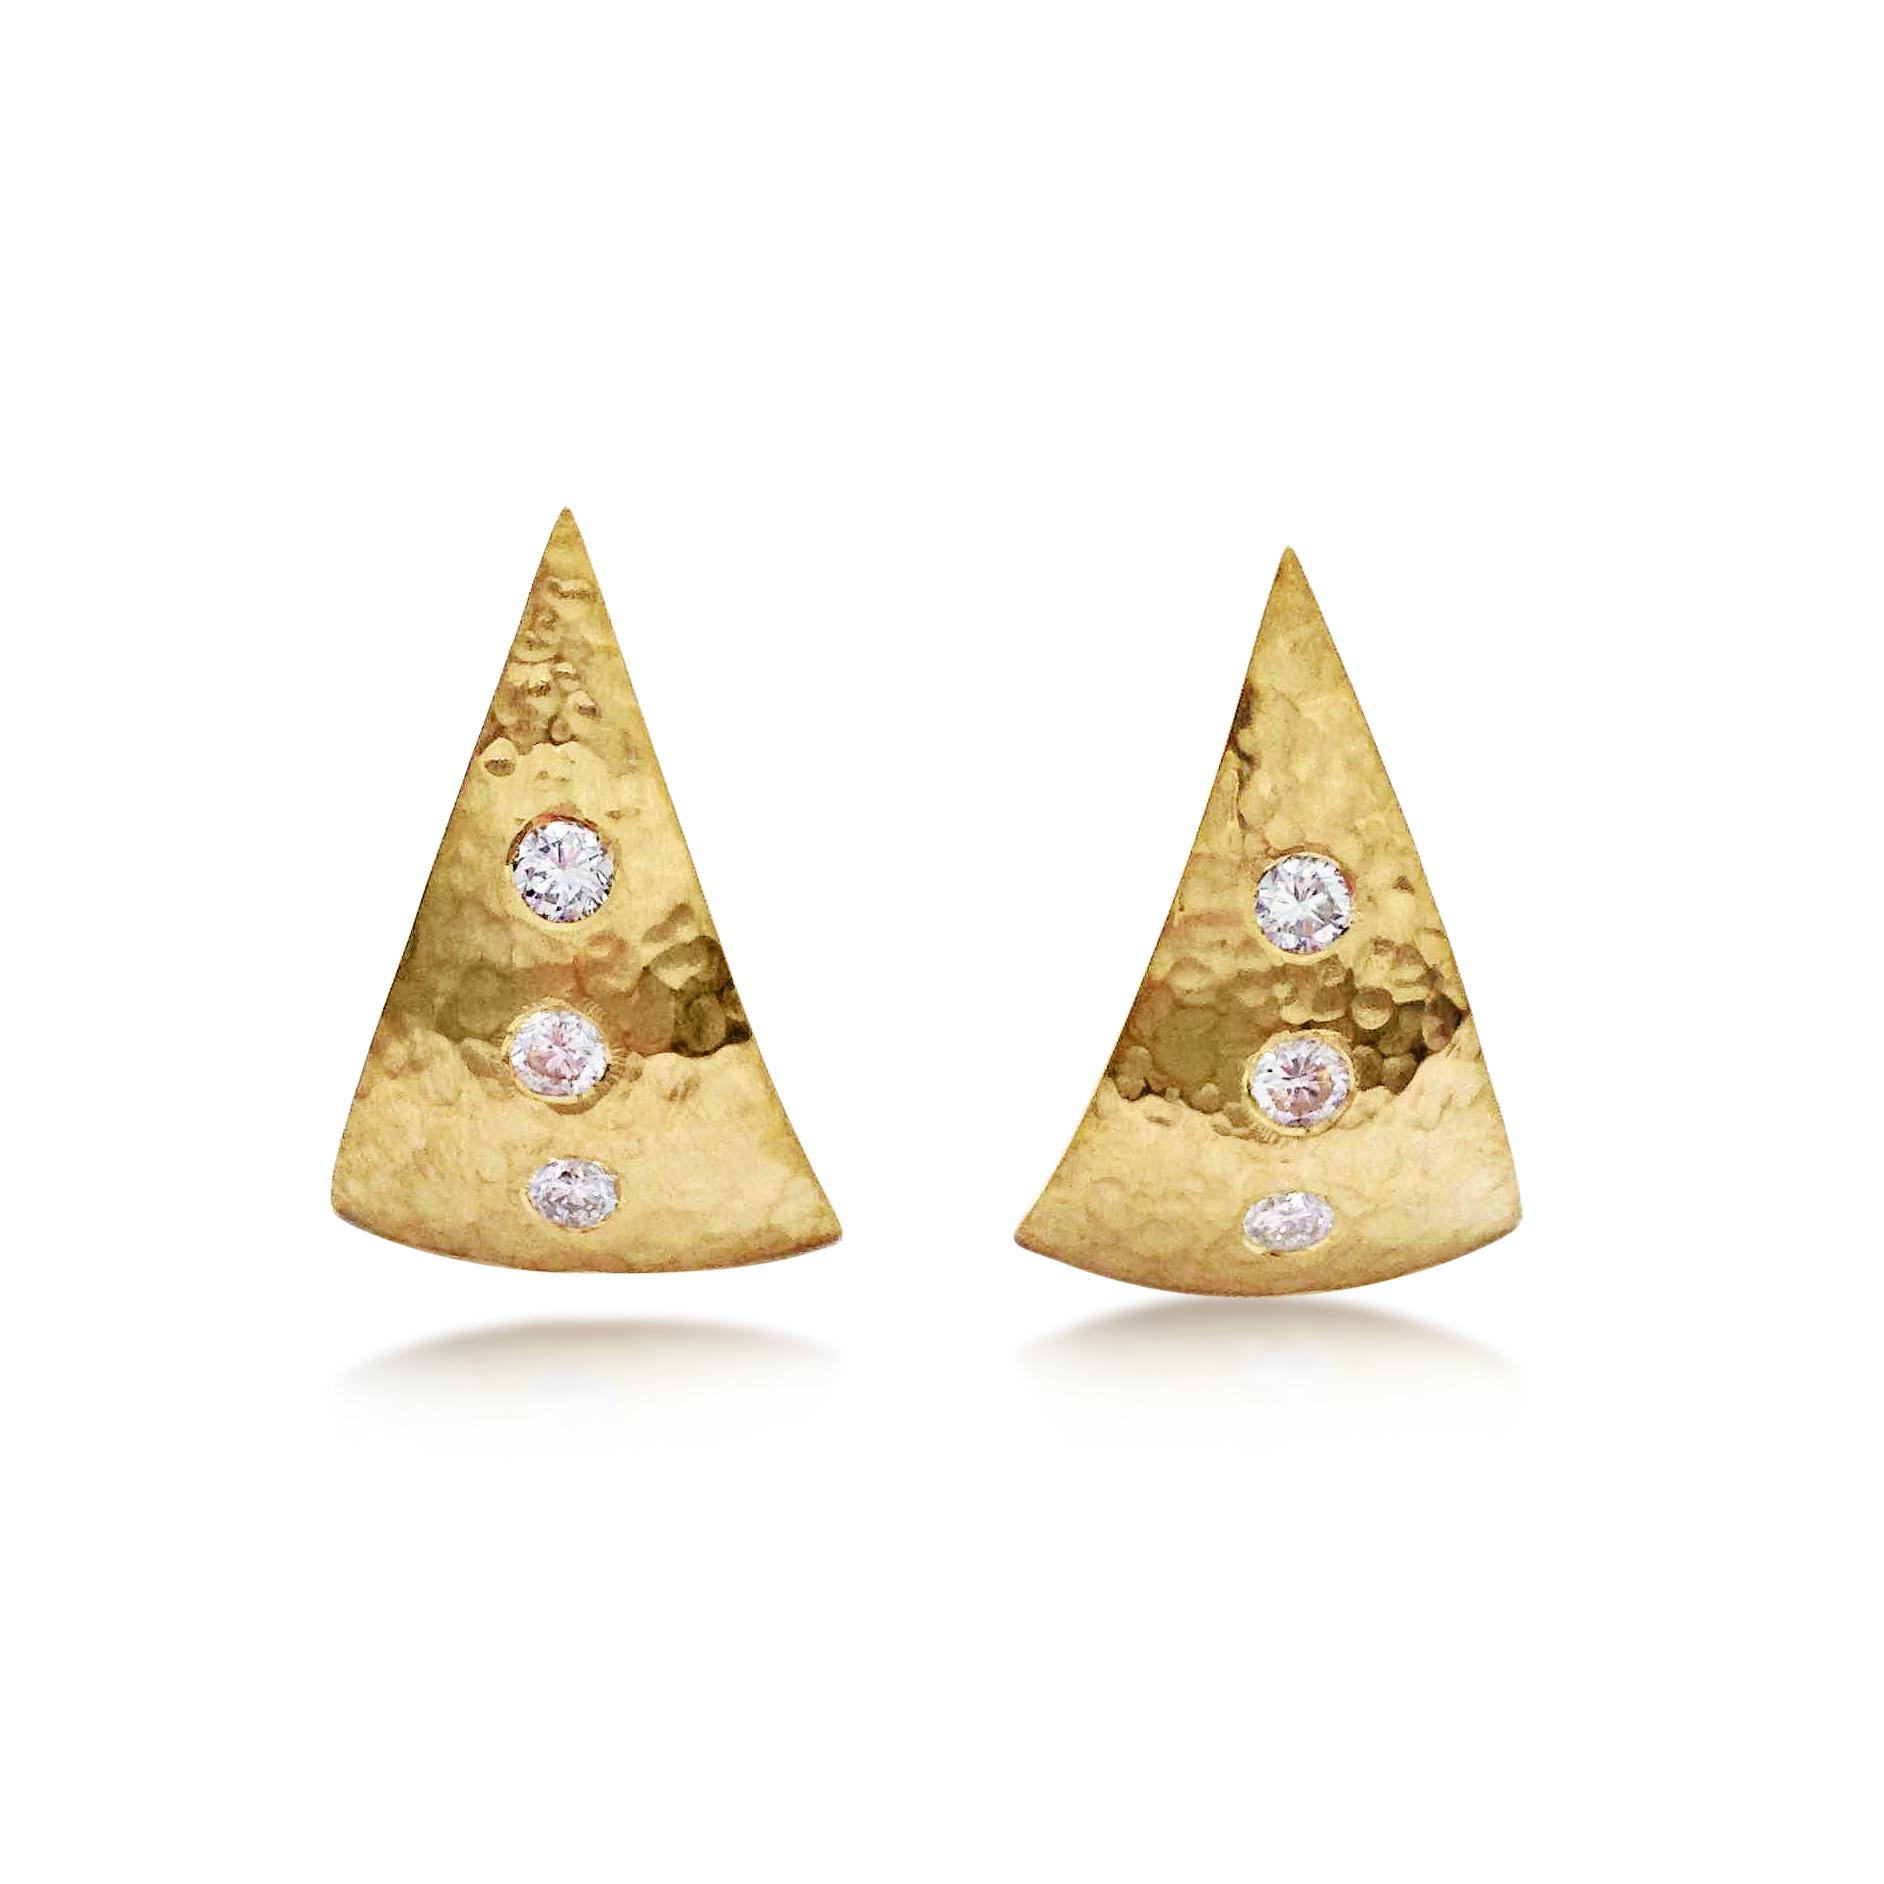 hammered-18ct-gold-and-diamond-triangular-earrings.jpg